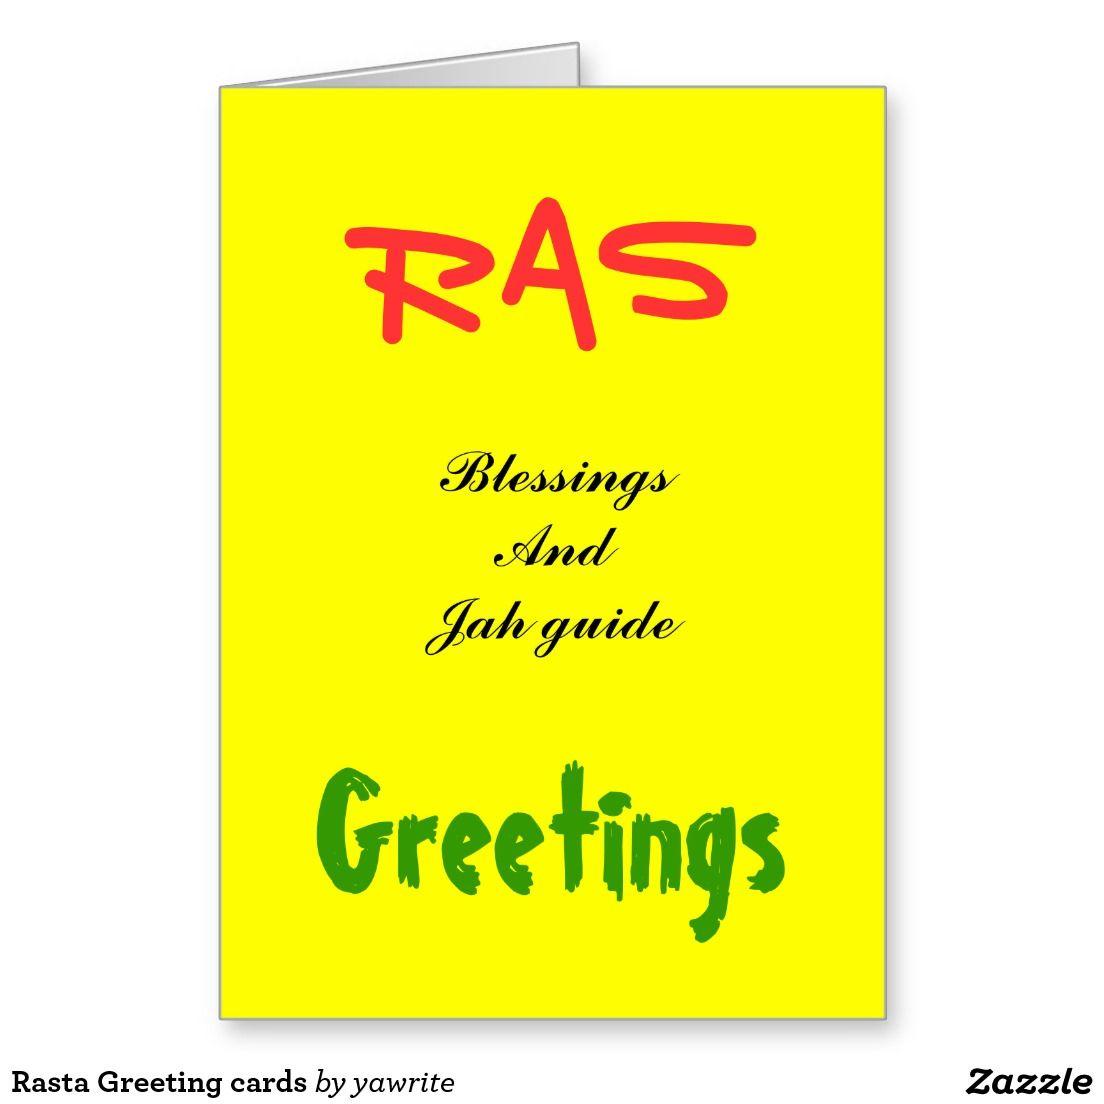 Rasta greeting cards christmas gifts pinterest greeting cards rasta greeting cards m4hsunfo